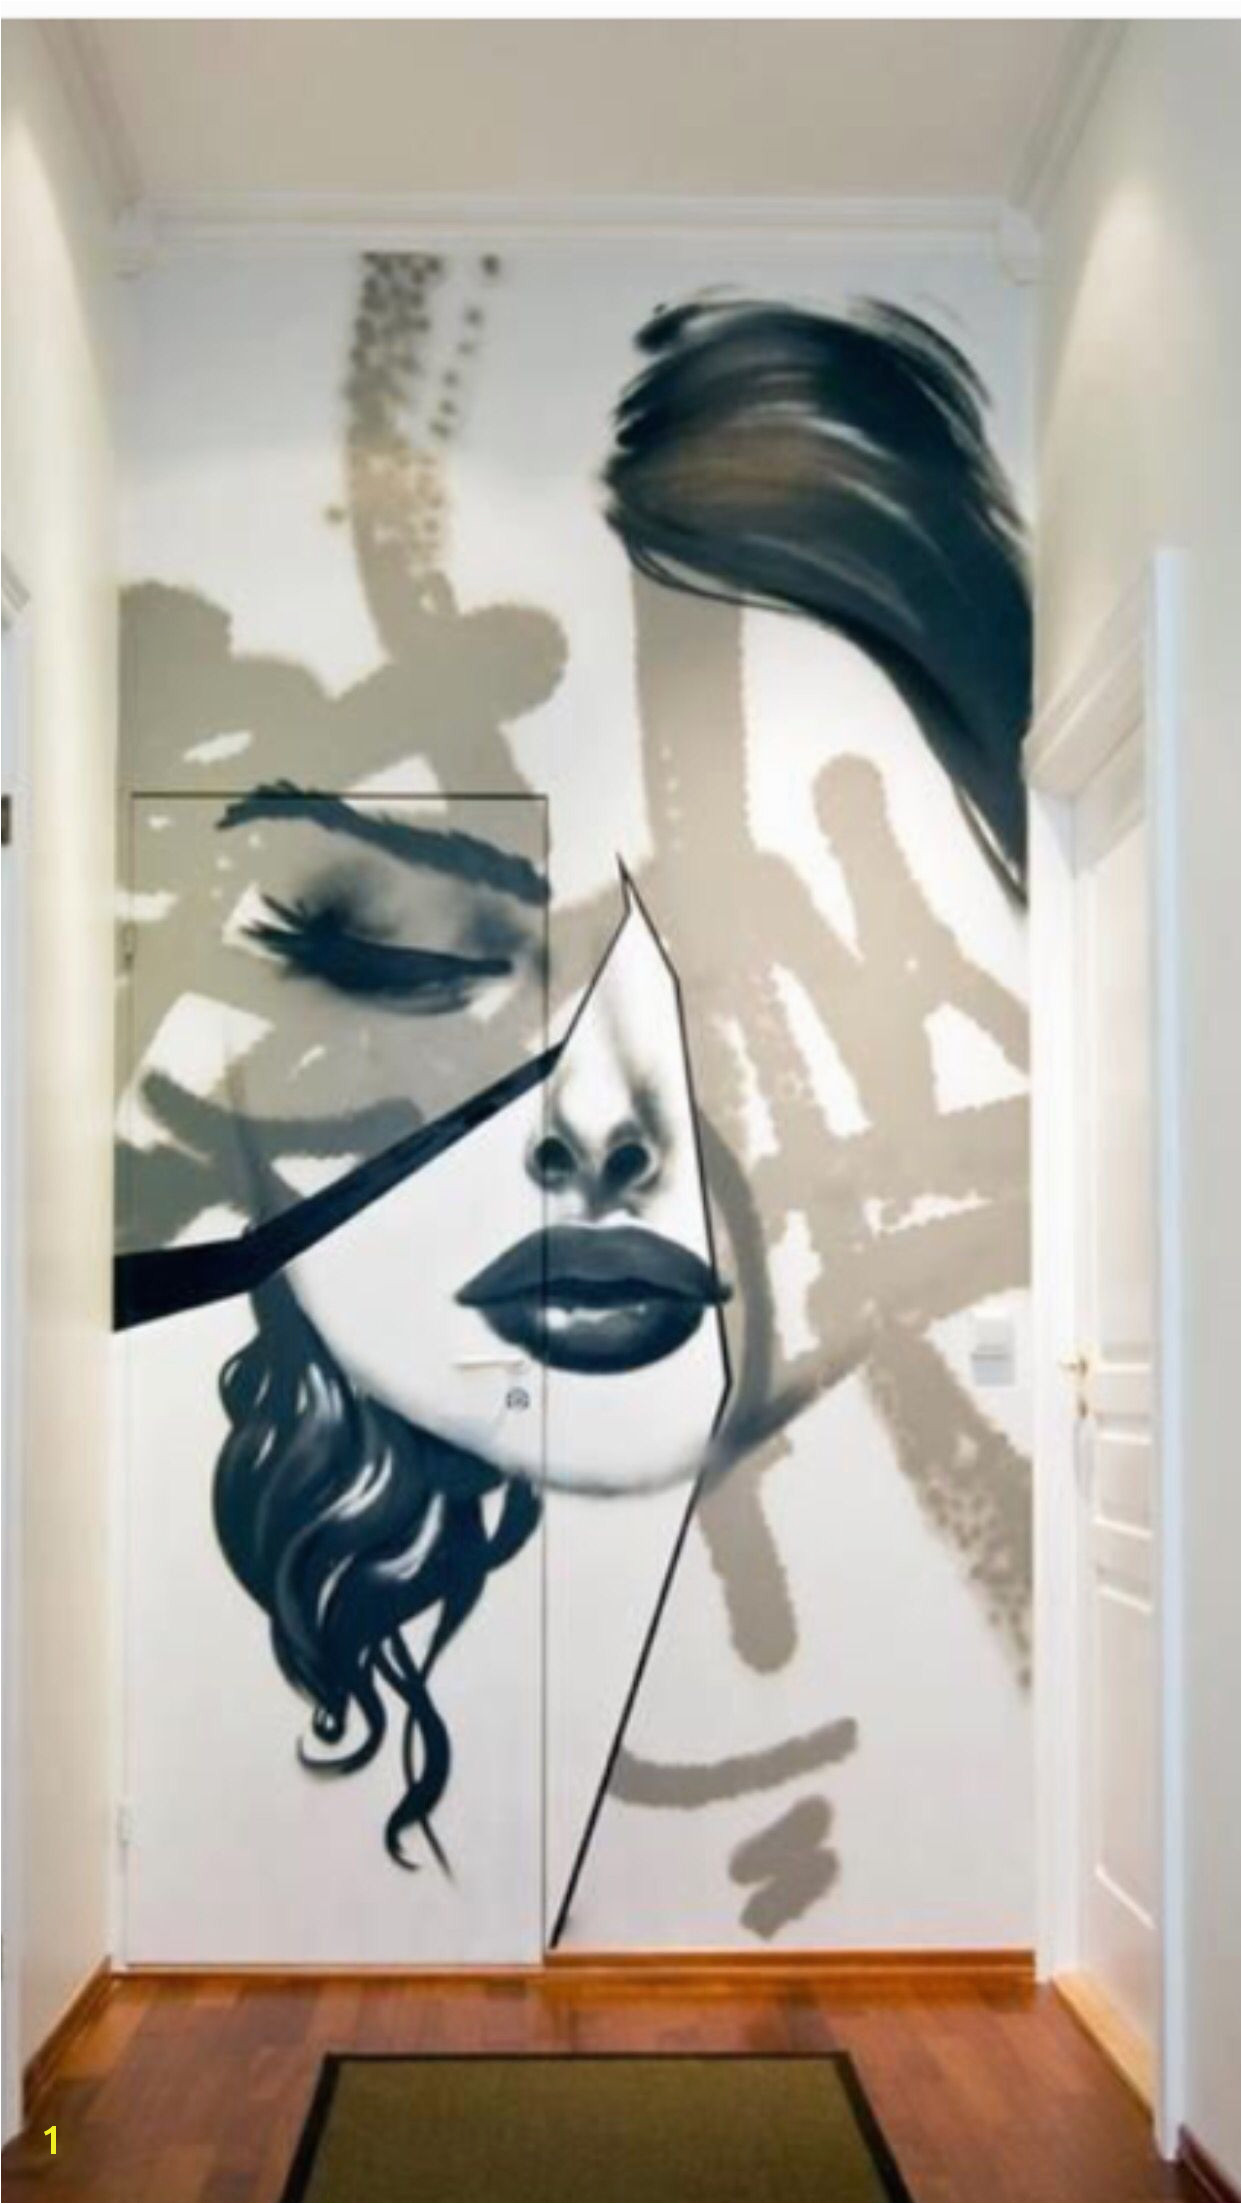 Salon mission for Blush Super mercial Art Graffiti Art